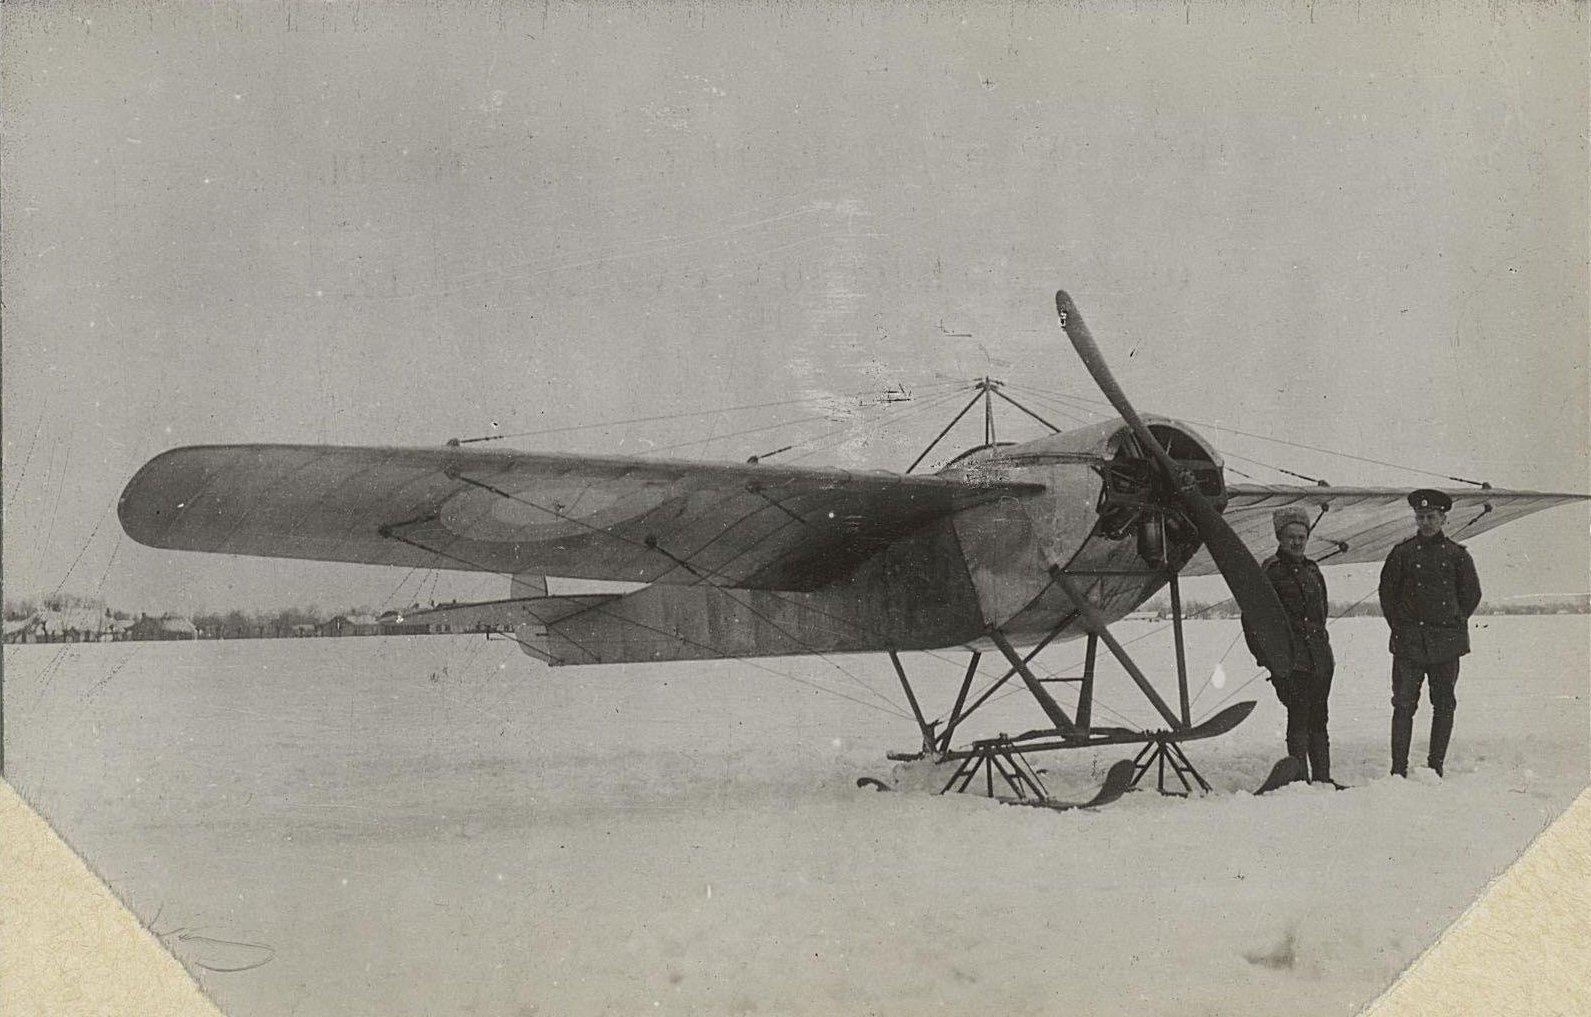 1915. Самолёт на лыжах на снегу. Рядом два лётчика